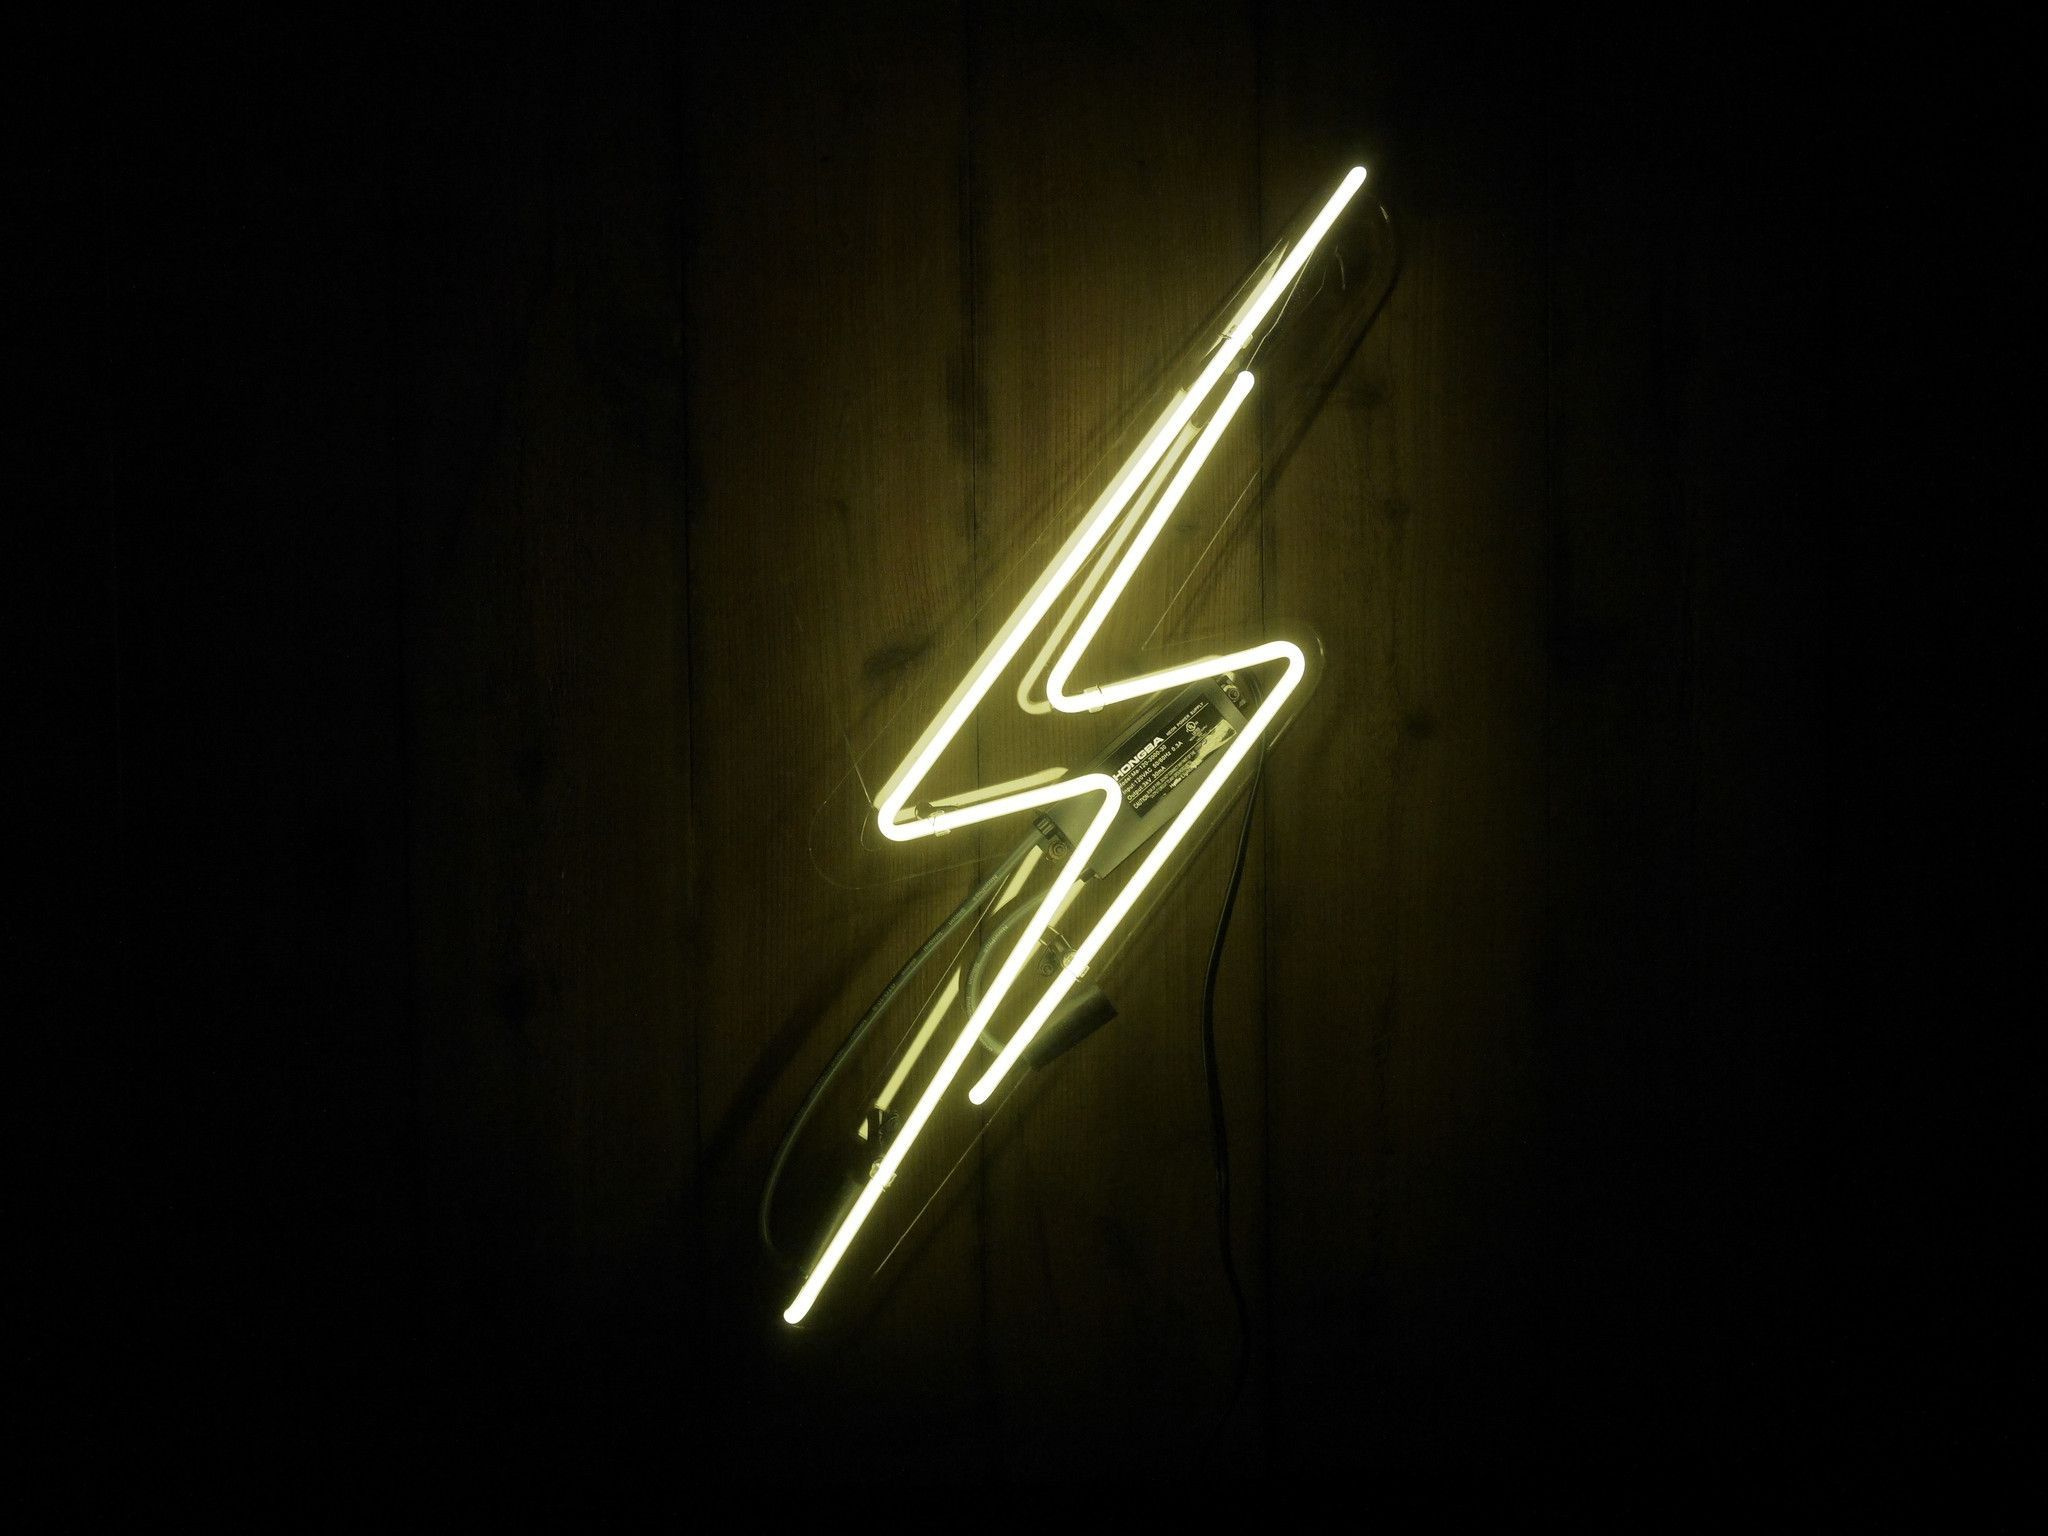 Lightning Bolt Neon Sign Neon Signs Neon Light Signs Neon Lighting